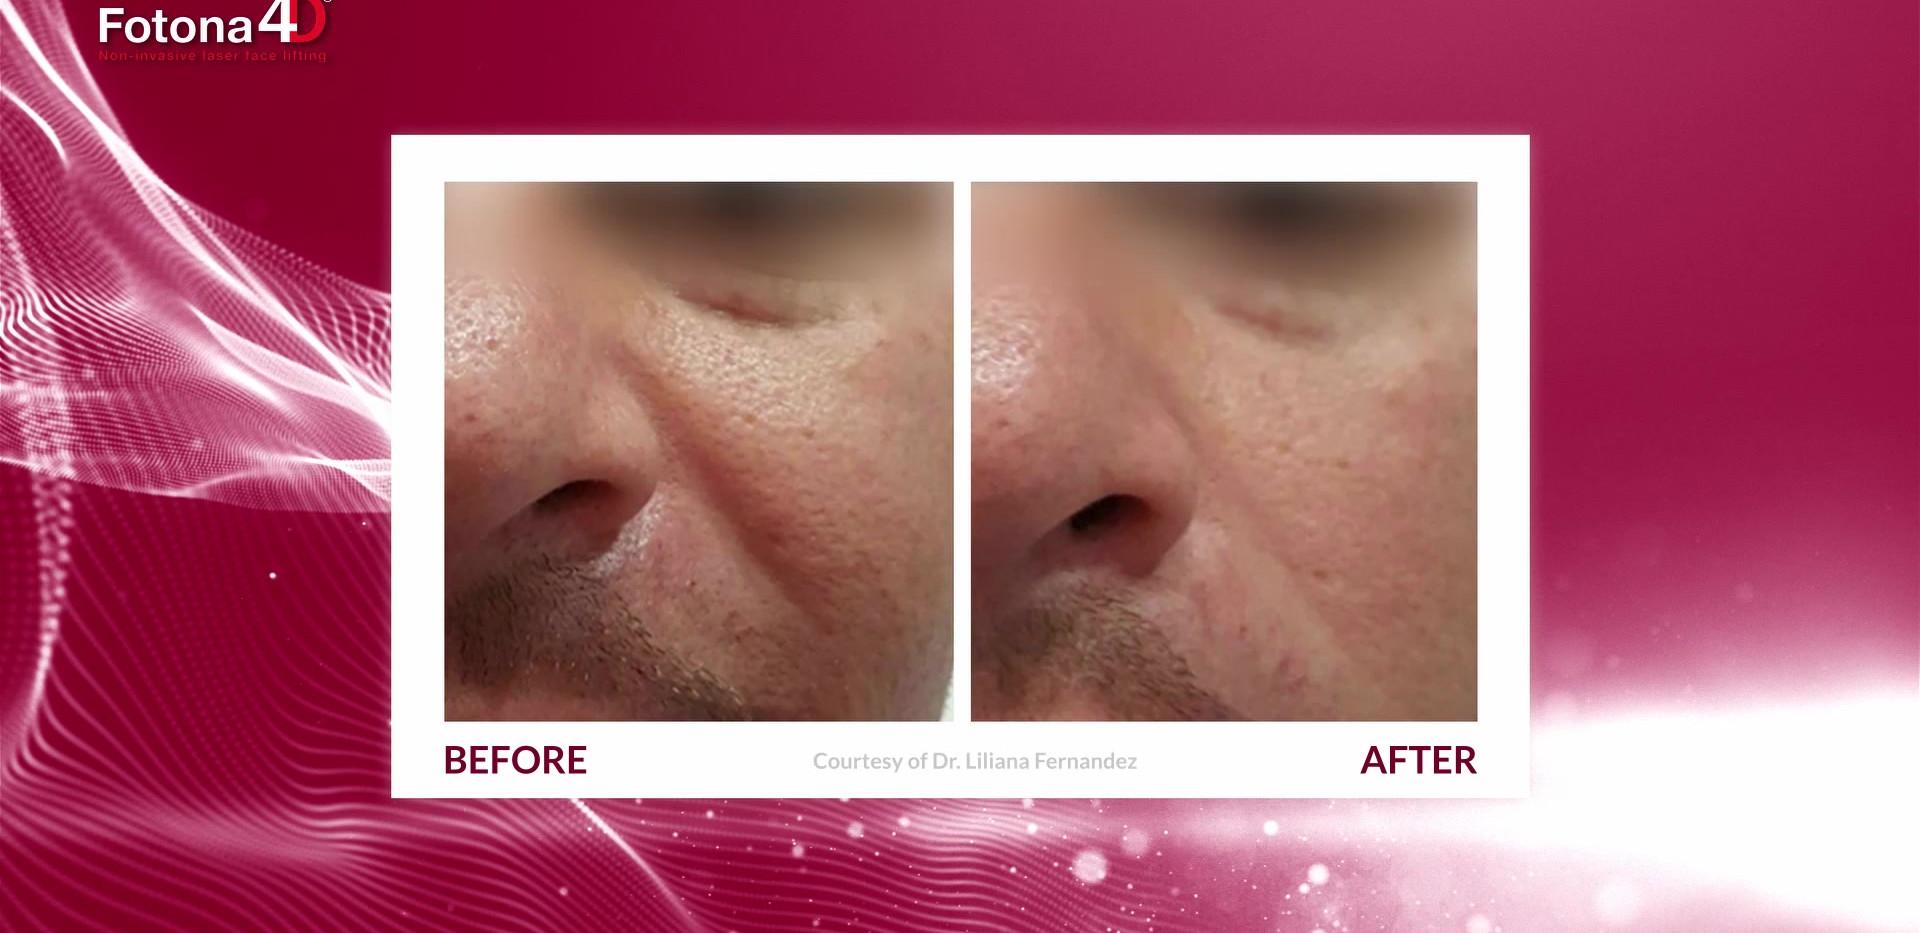 Fotona4D - Non-invasive Laser Facelift